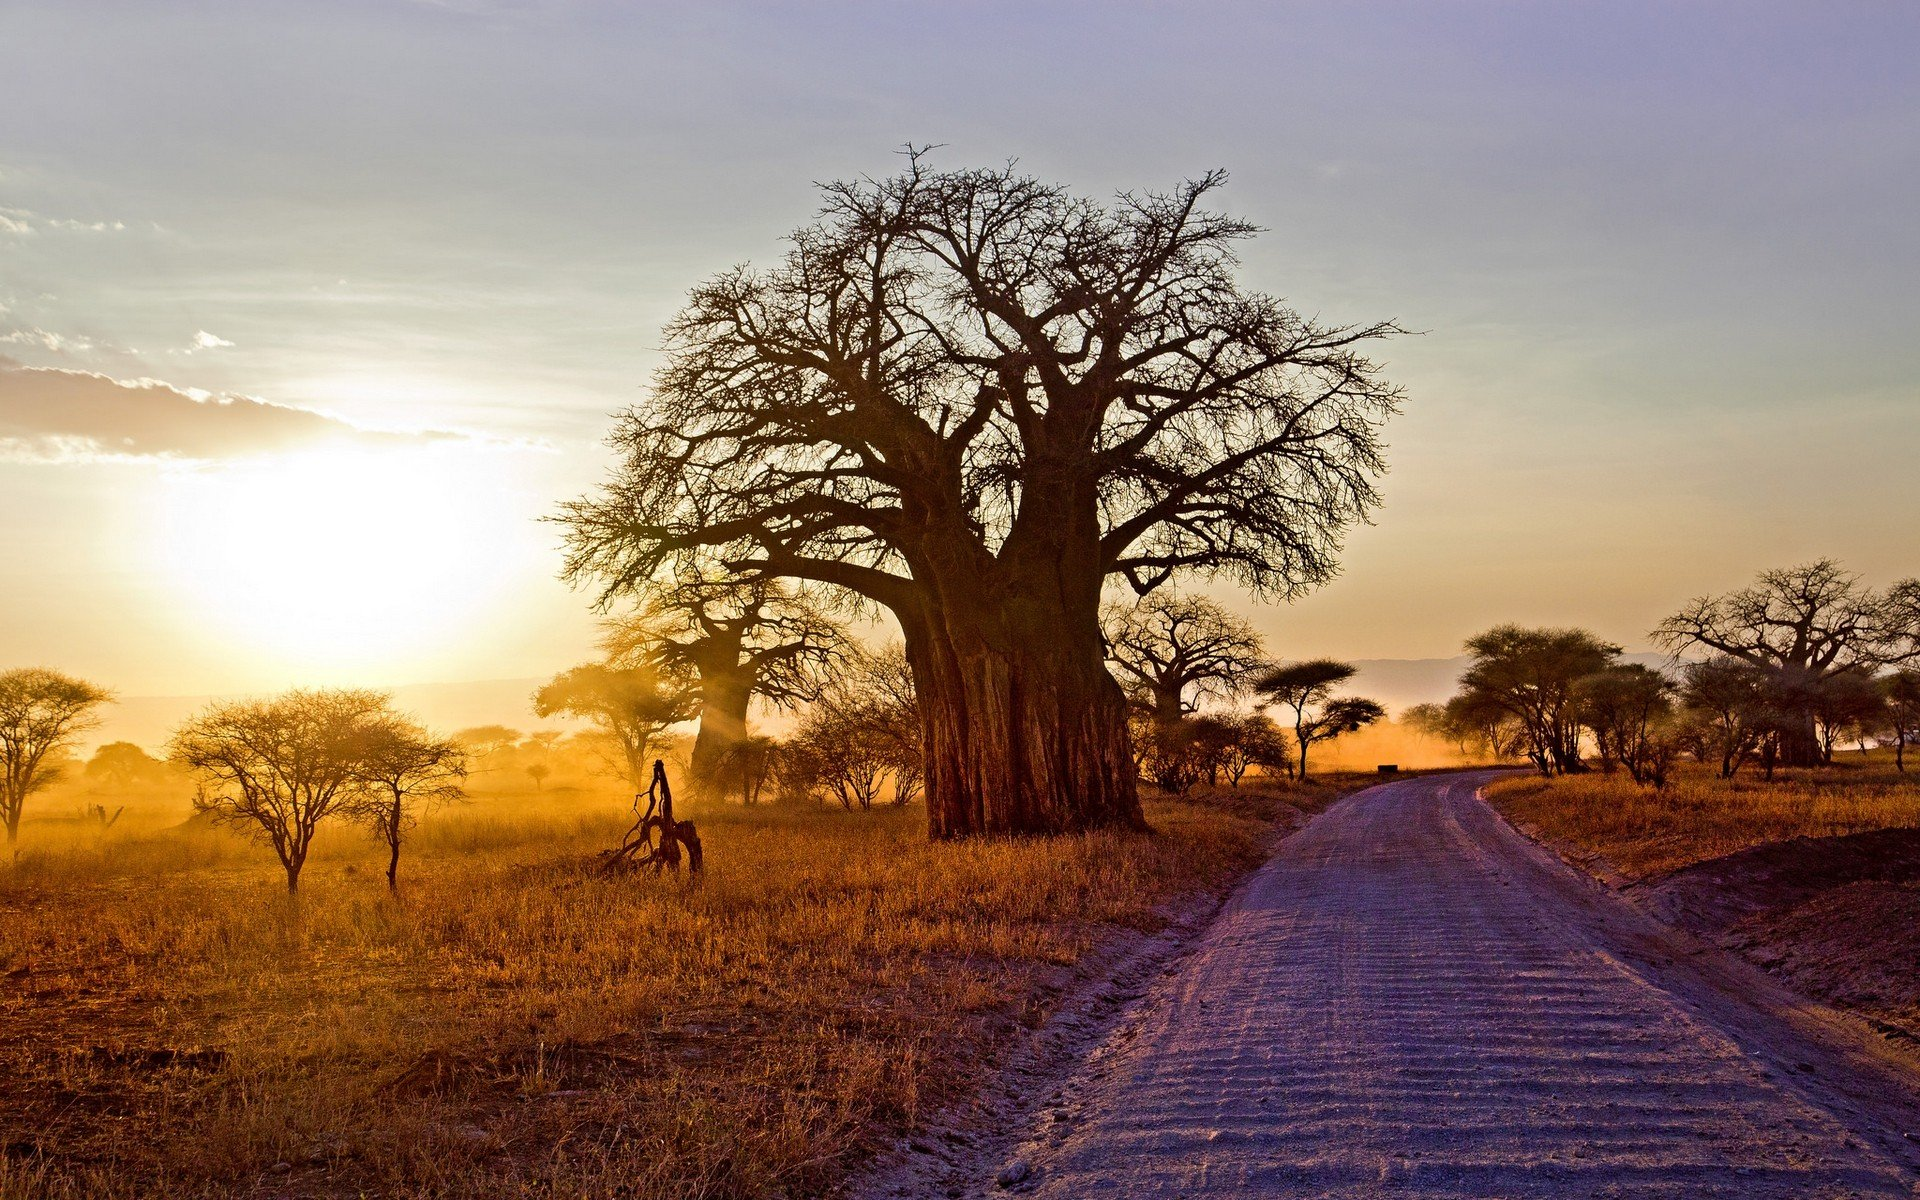 baobab_arbol_africa_naturaleza_1920x1200